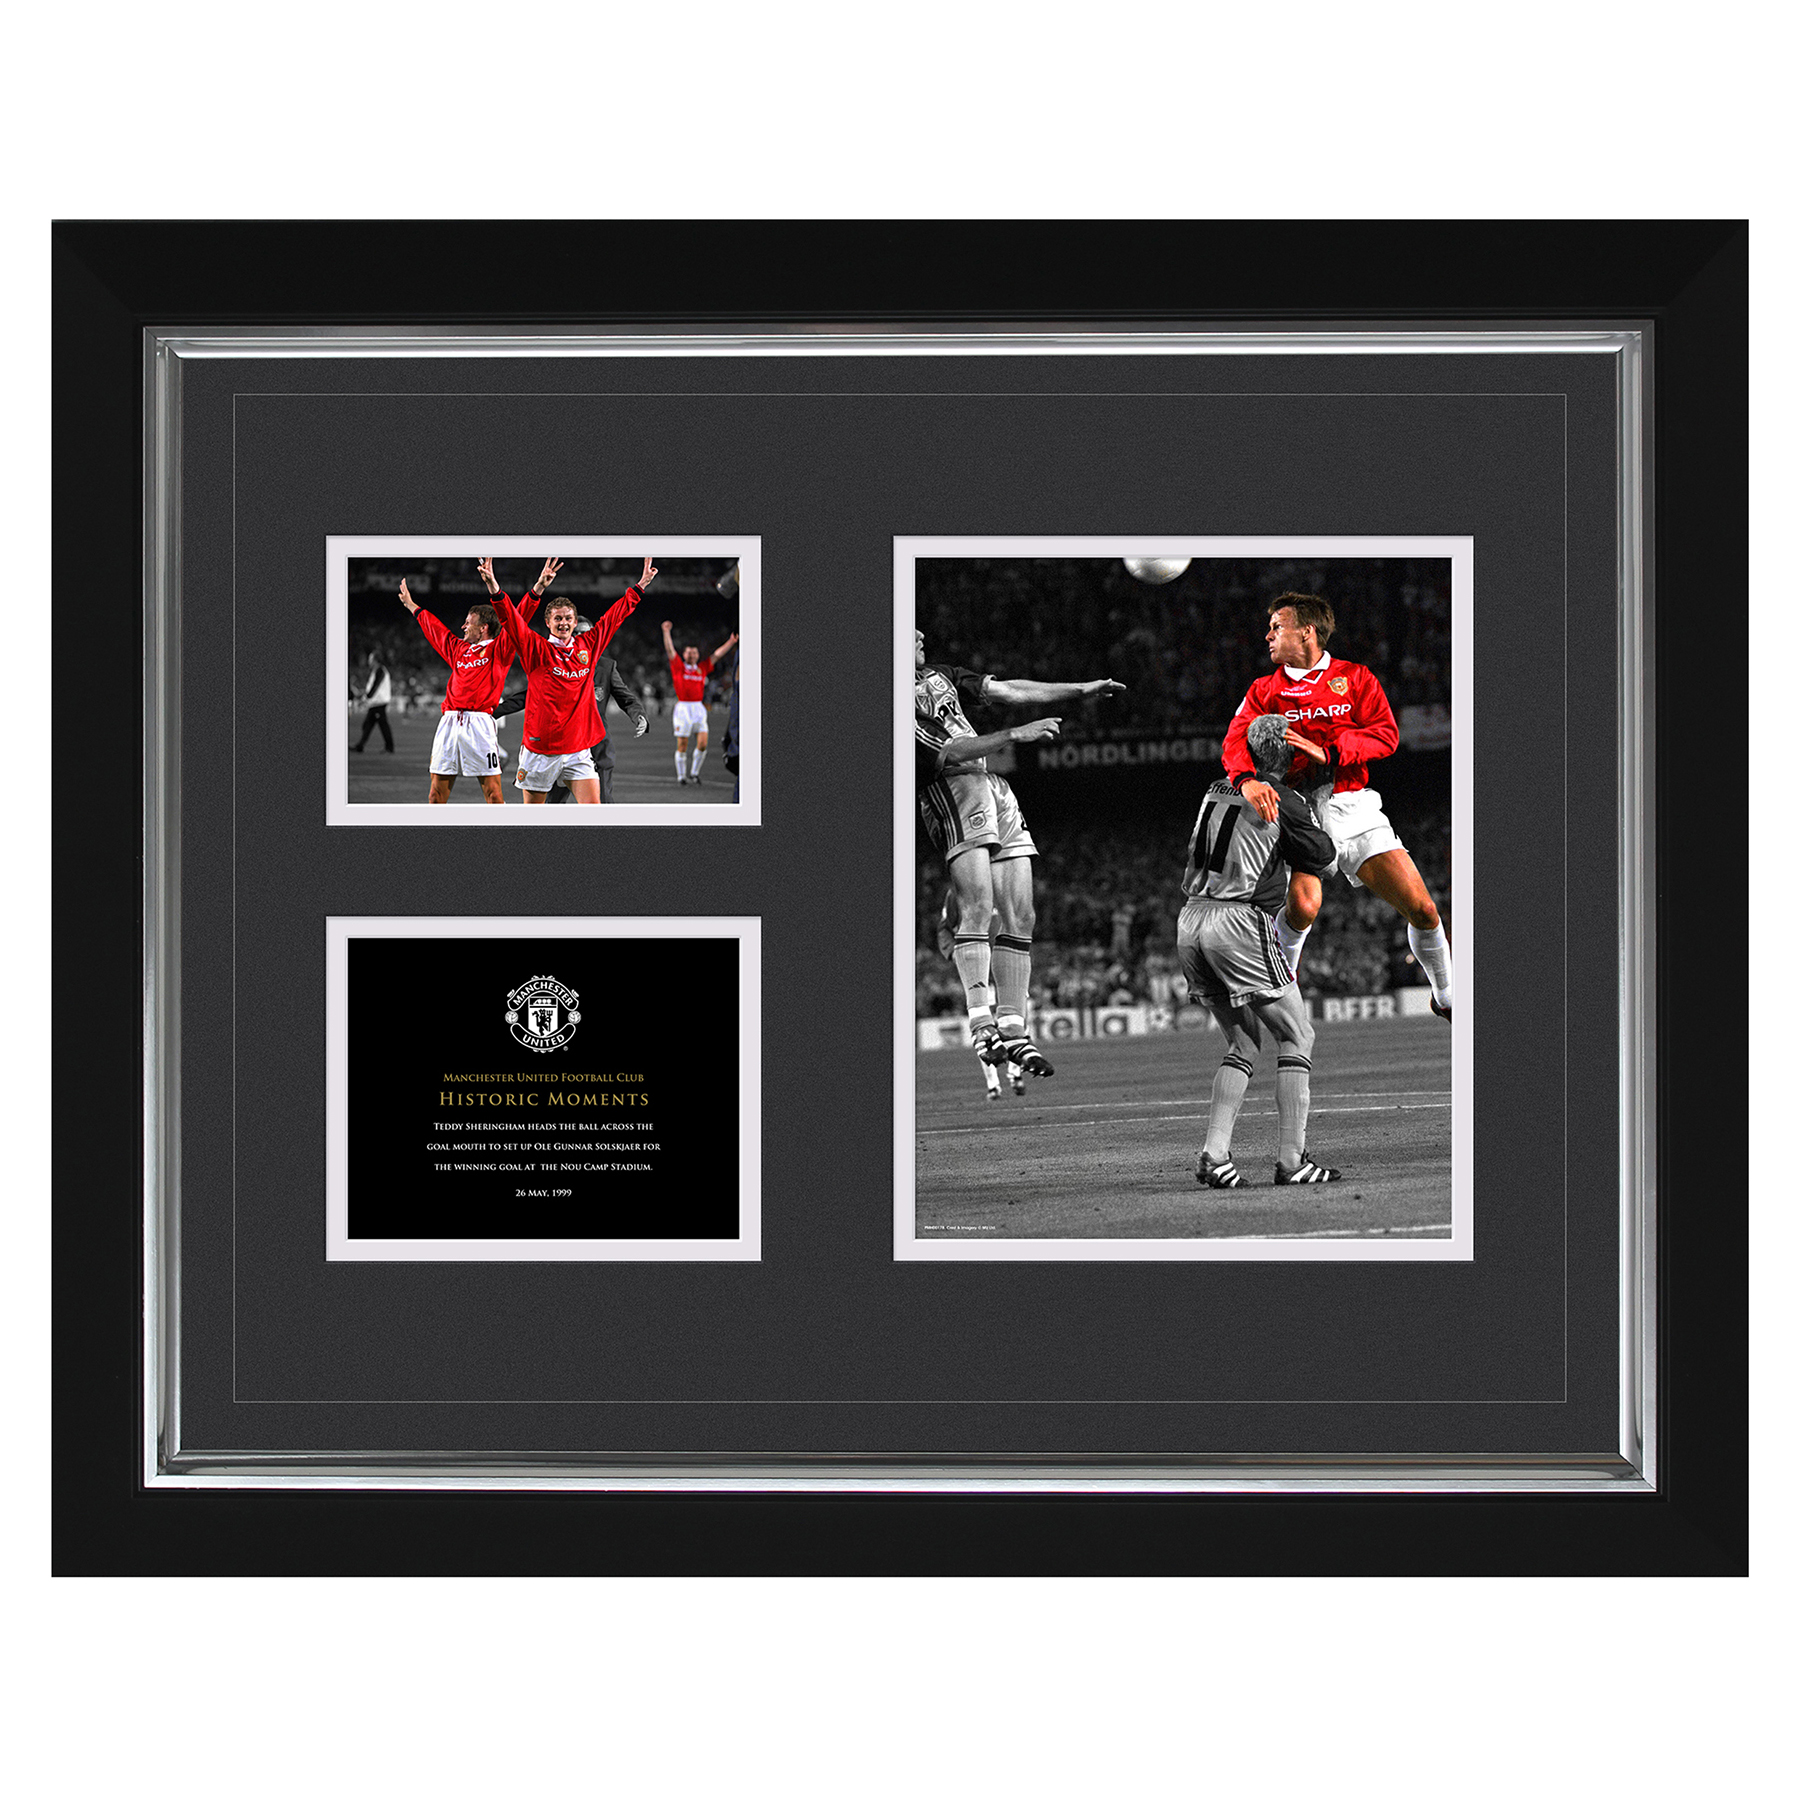 Manchester United Historic Moments - Sheringham 1999 Framed Print - 20 x 16 Inch